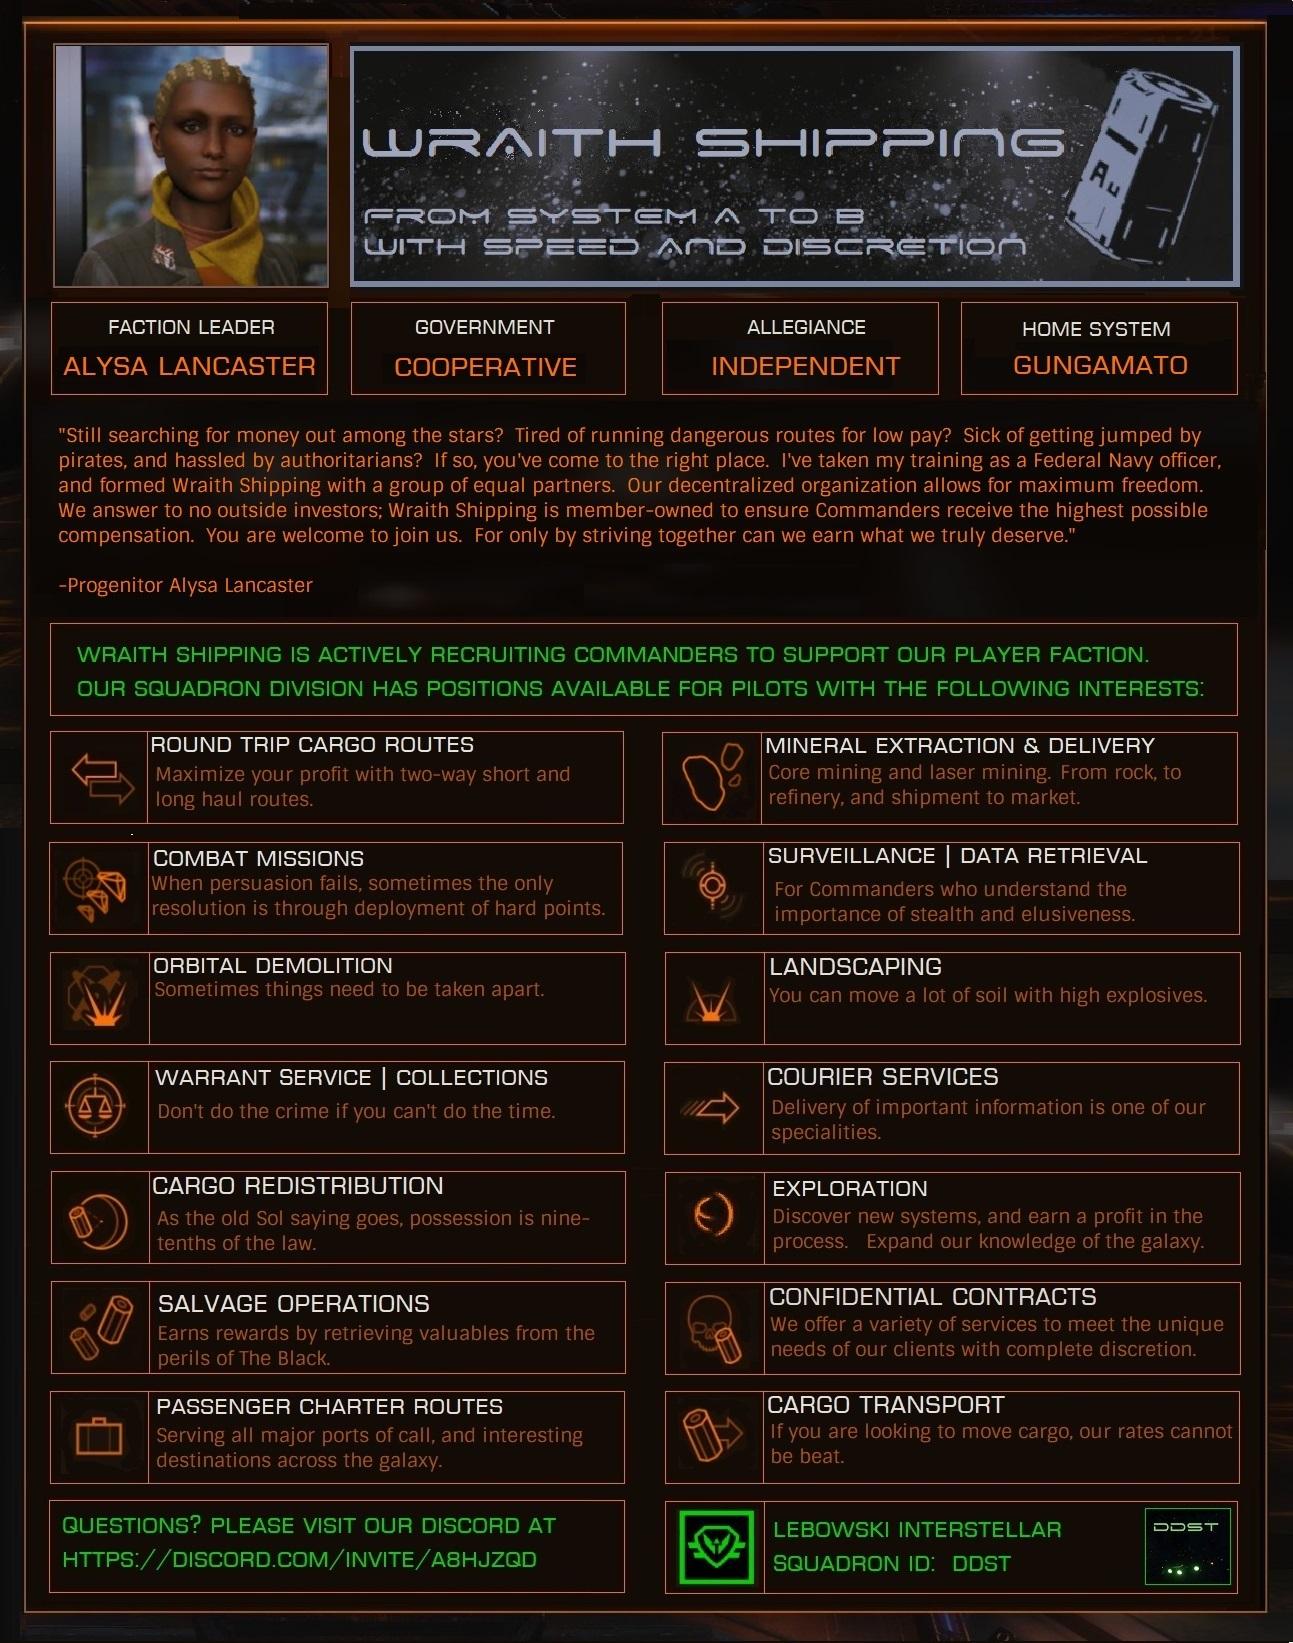 WraithRecruitingFinal.jpg